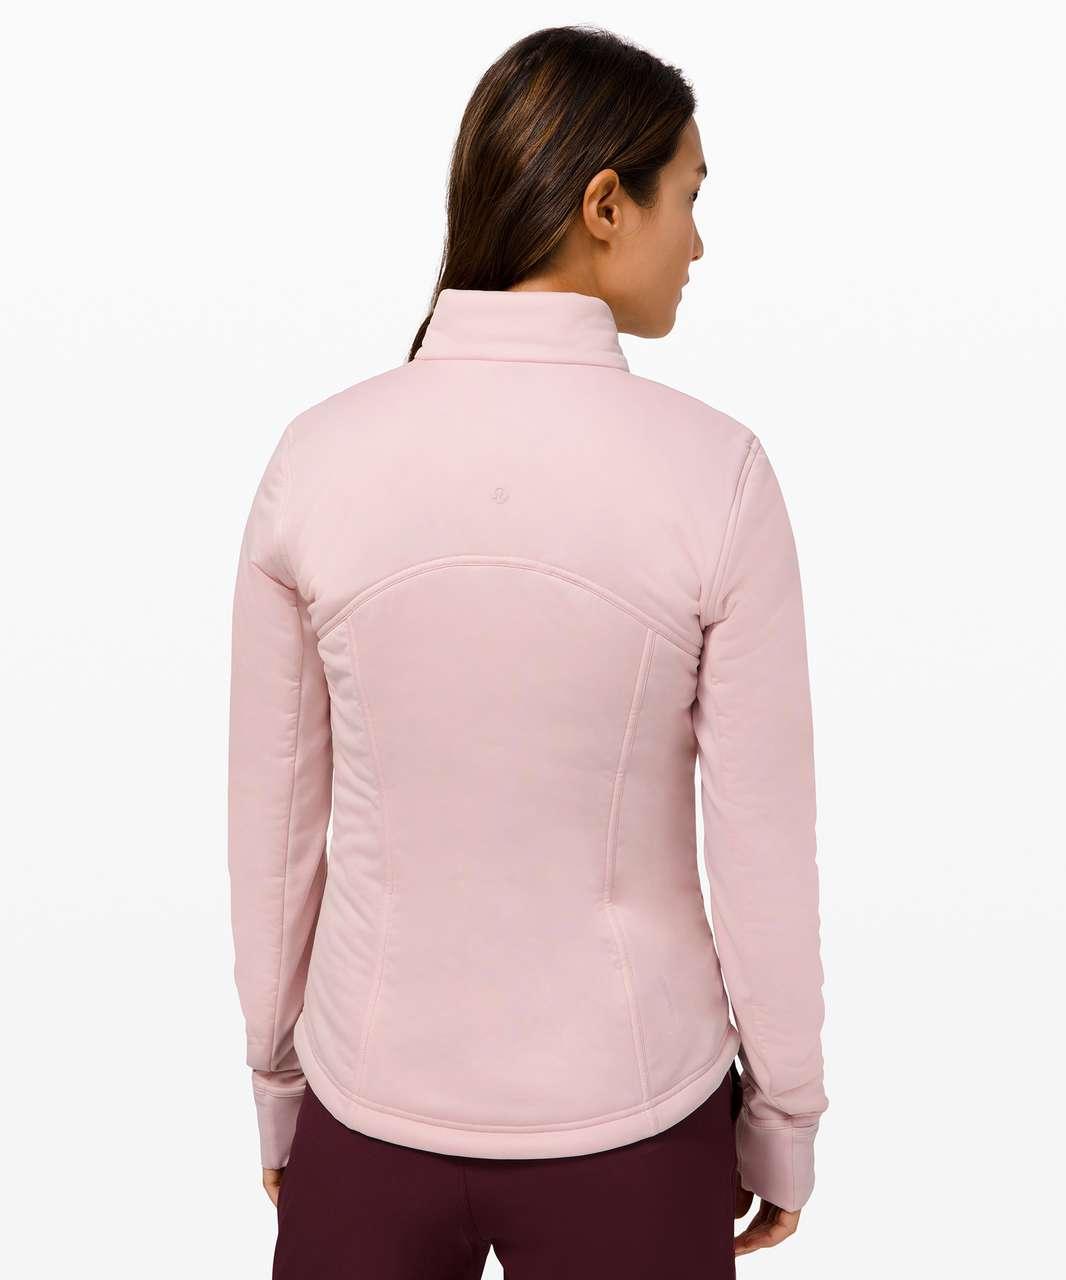 Lululemon Dynamic Movement Jacket - Porcelain Pink